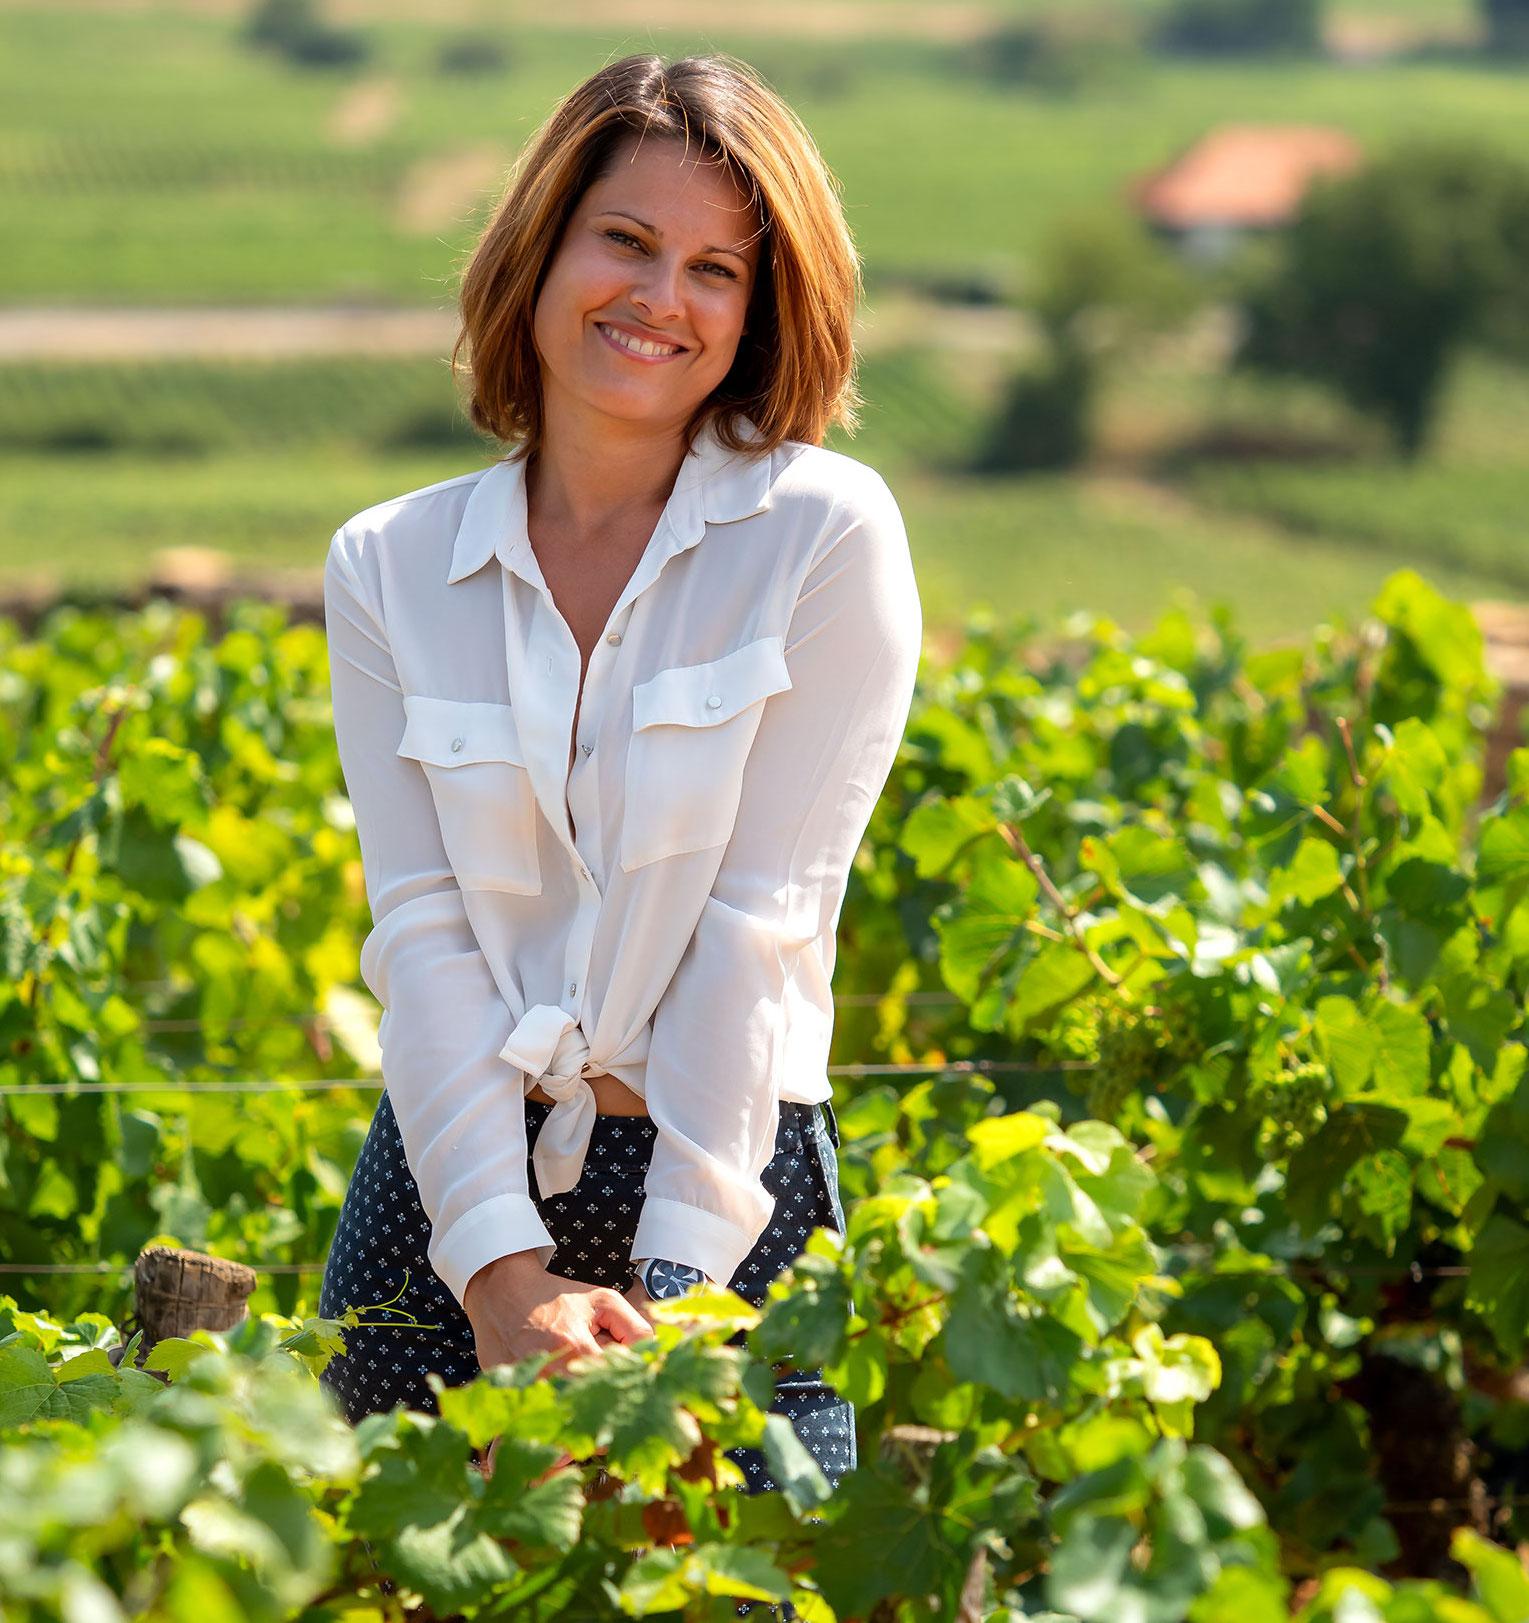 Burgundy Wine Tours by Sonia Guyon